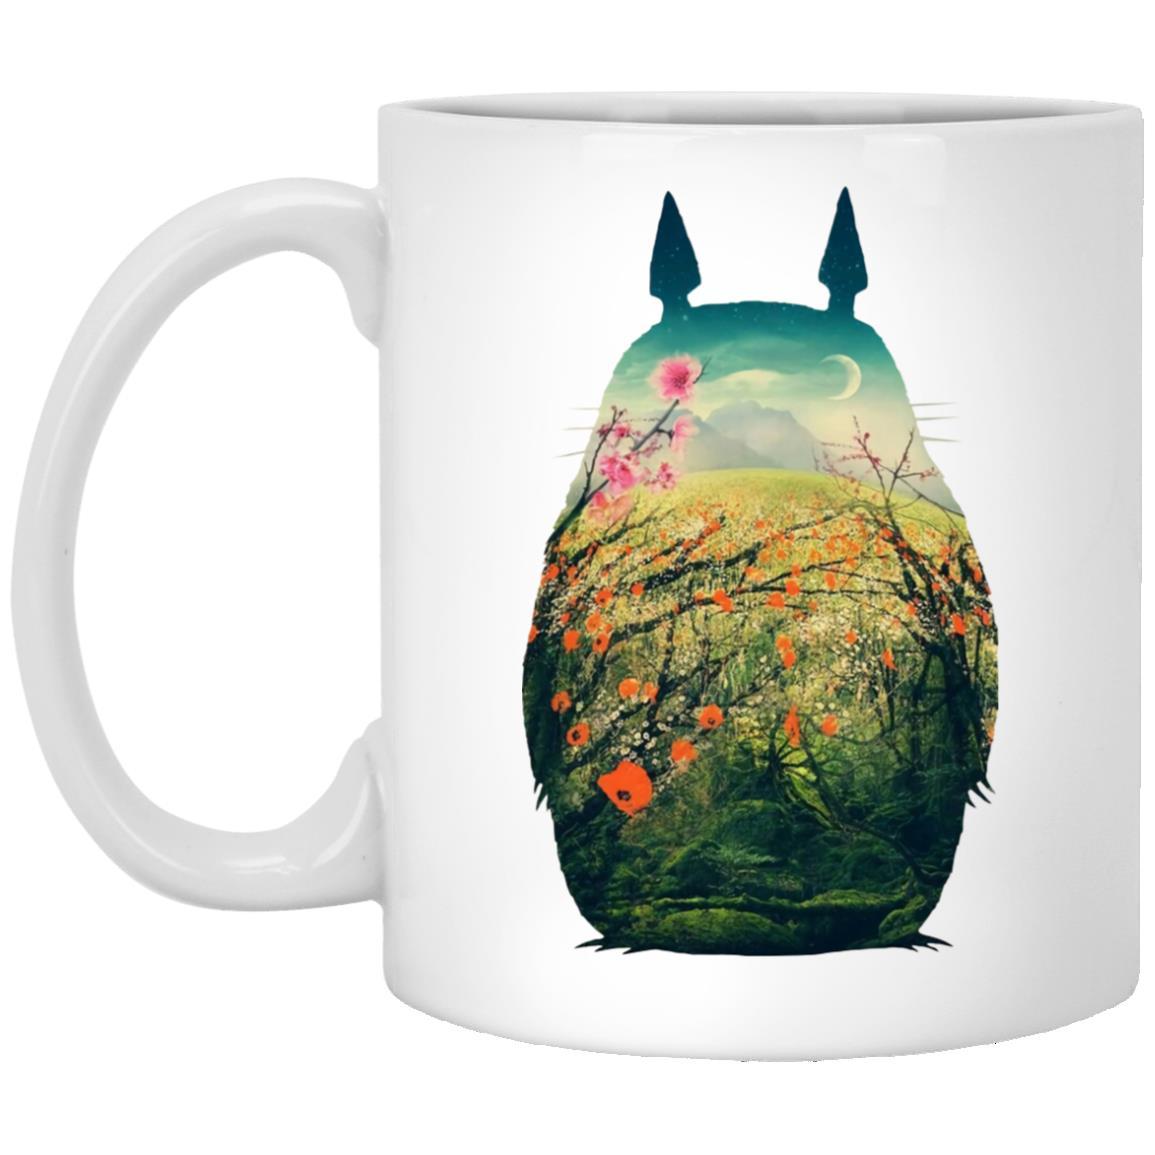 My Neighbor Totoro Colorful Cutout Mug